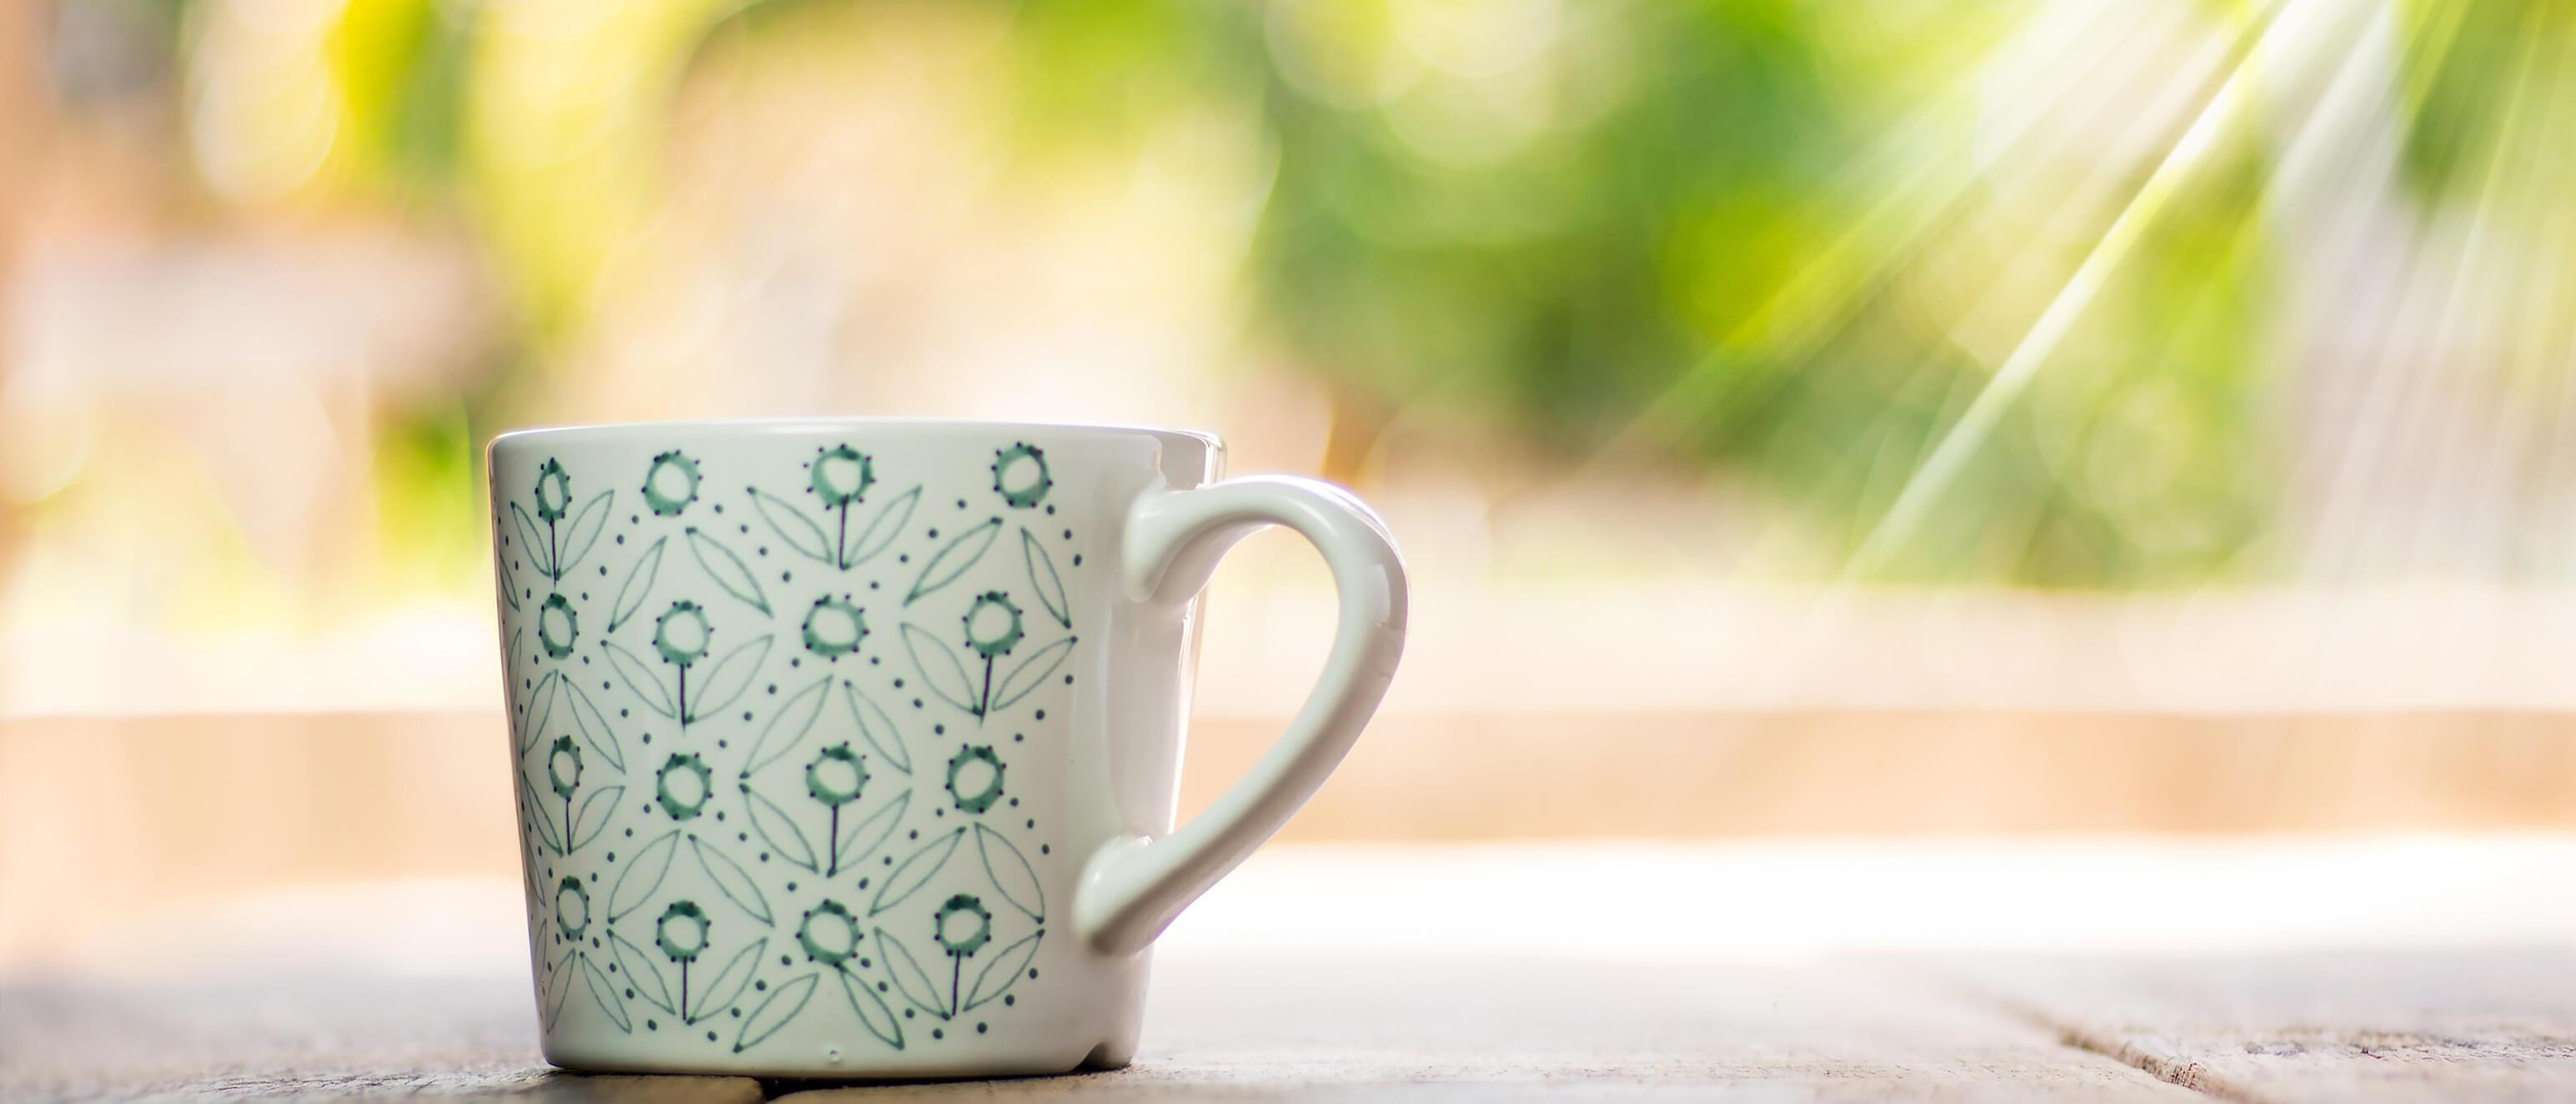 Green Tea, A Great Guest Twofer